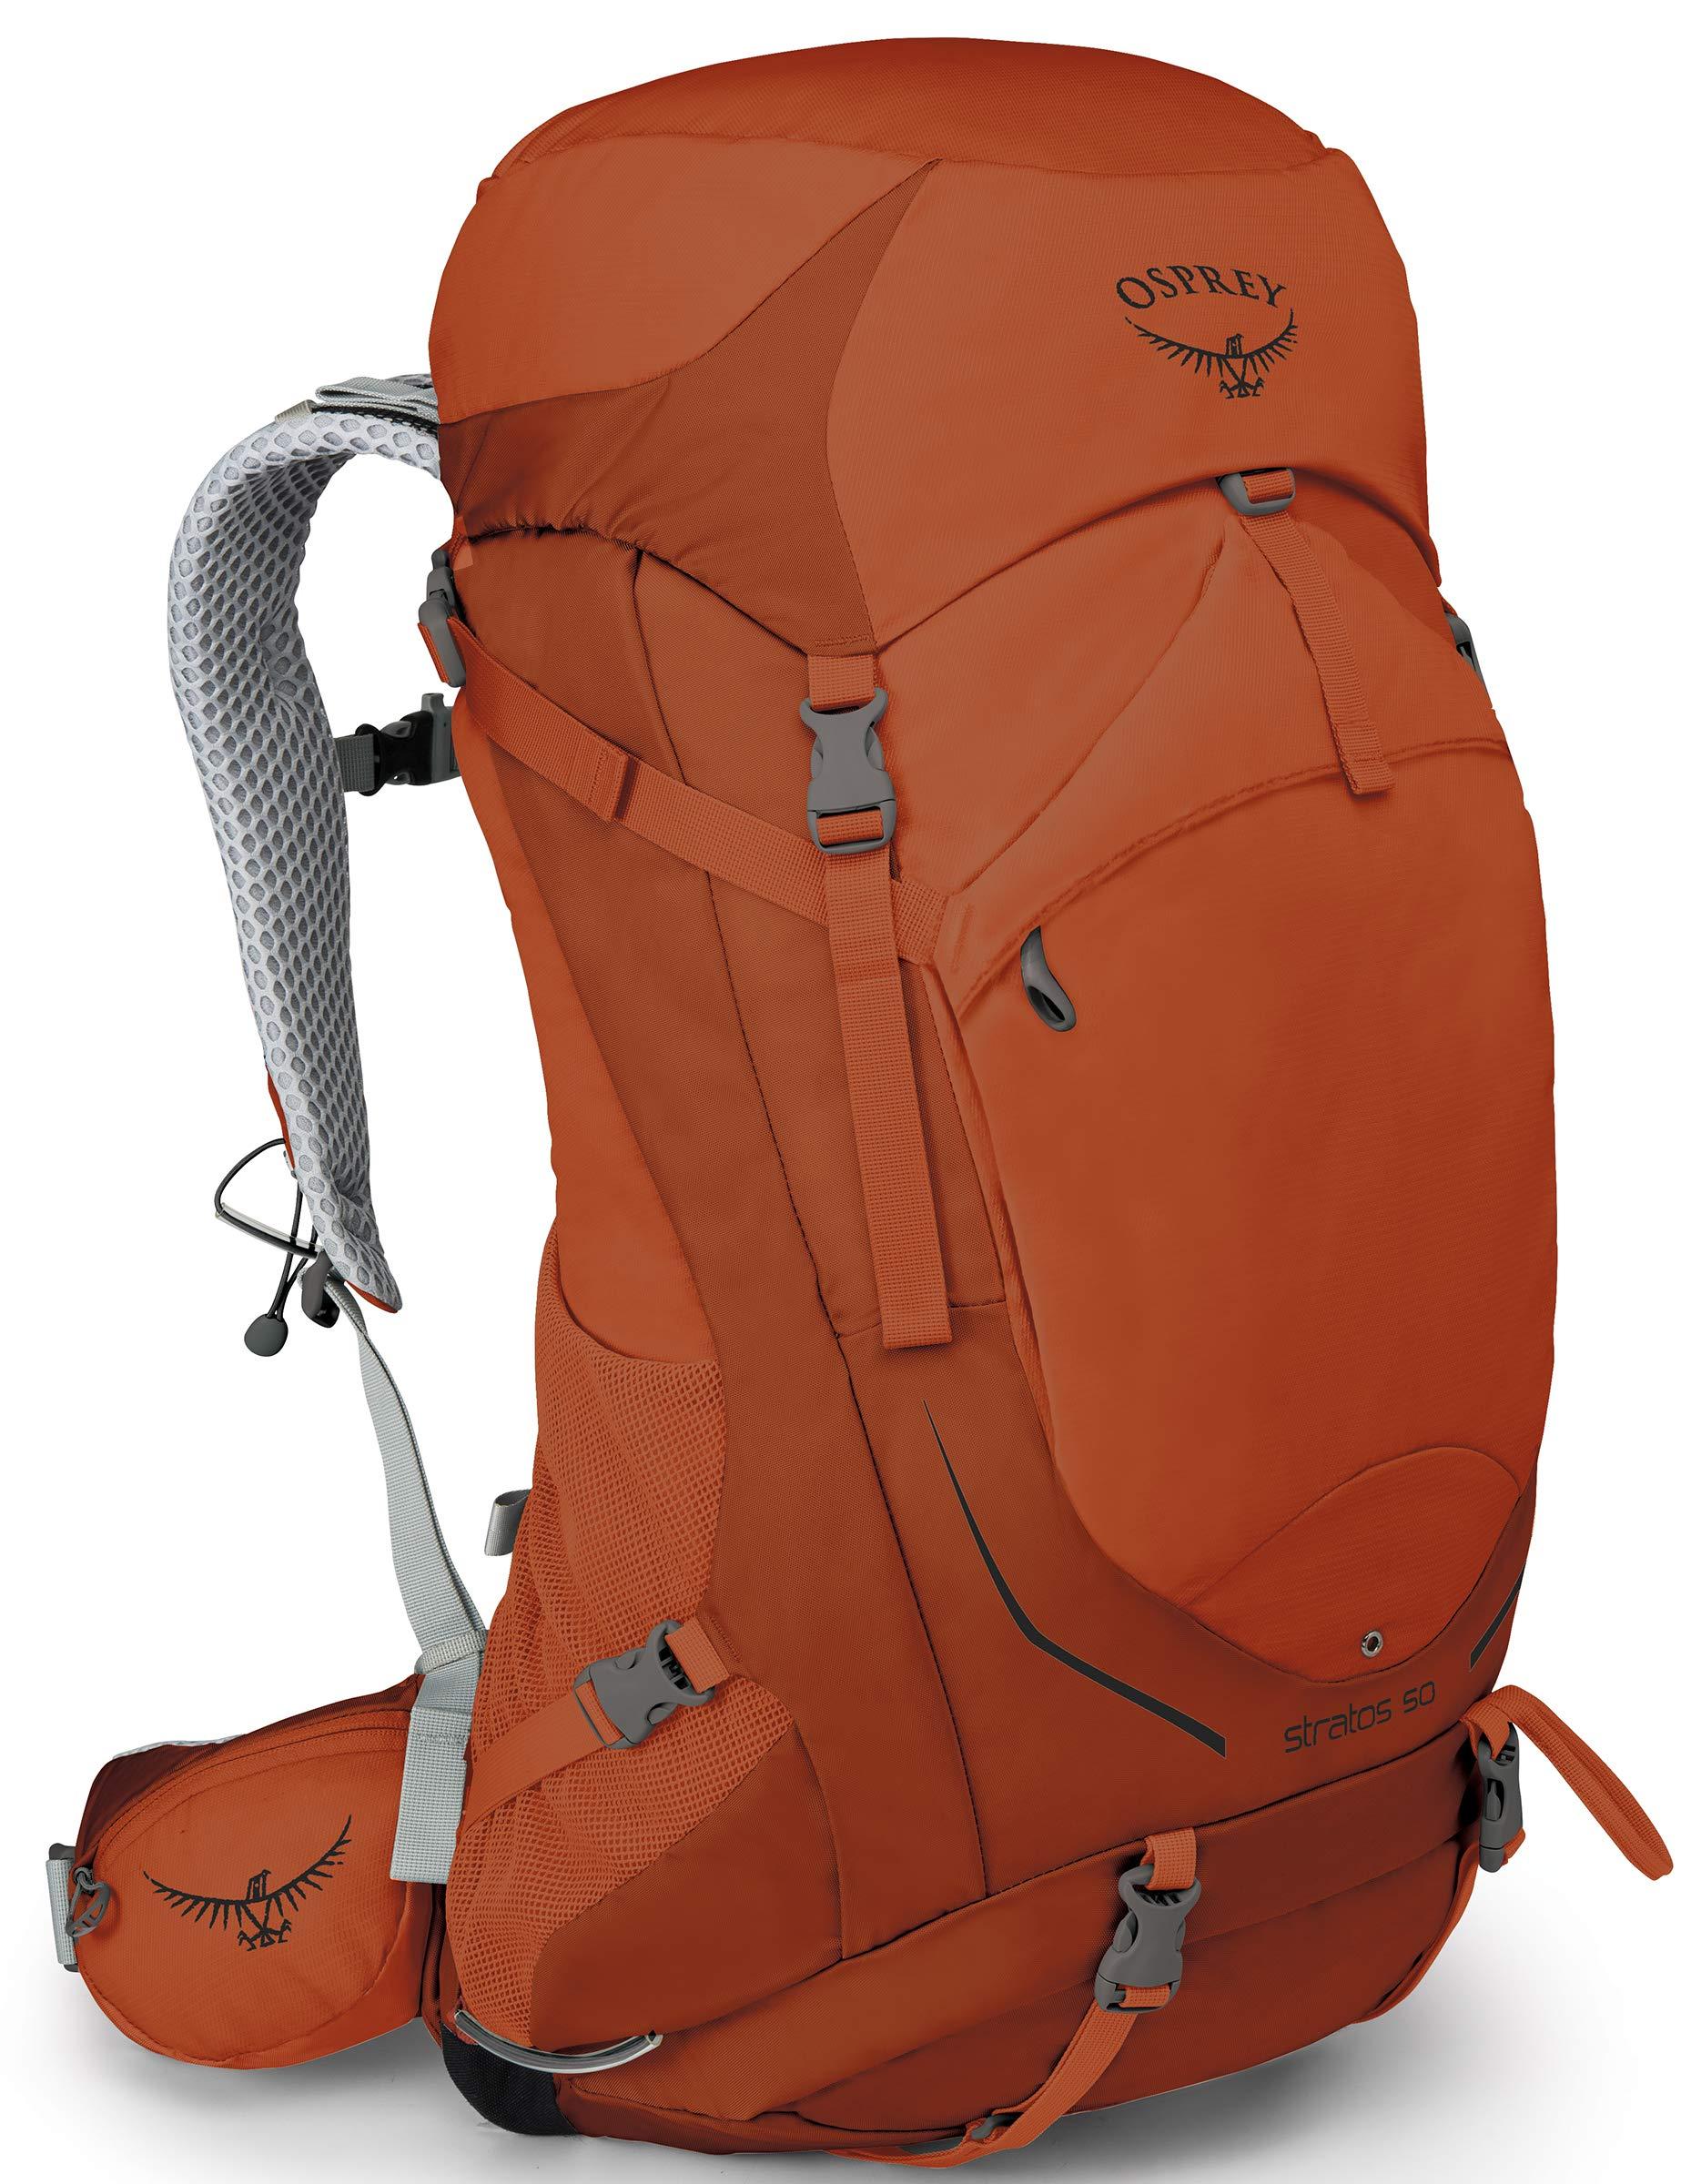 Osprey Packs Stratos 50 Backpacking Backpack, Sungrazer Orange, Small/Medium